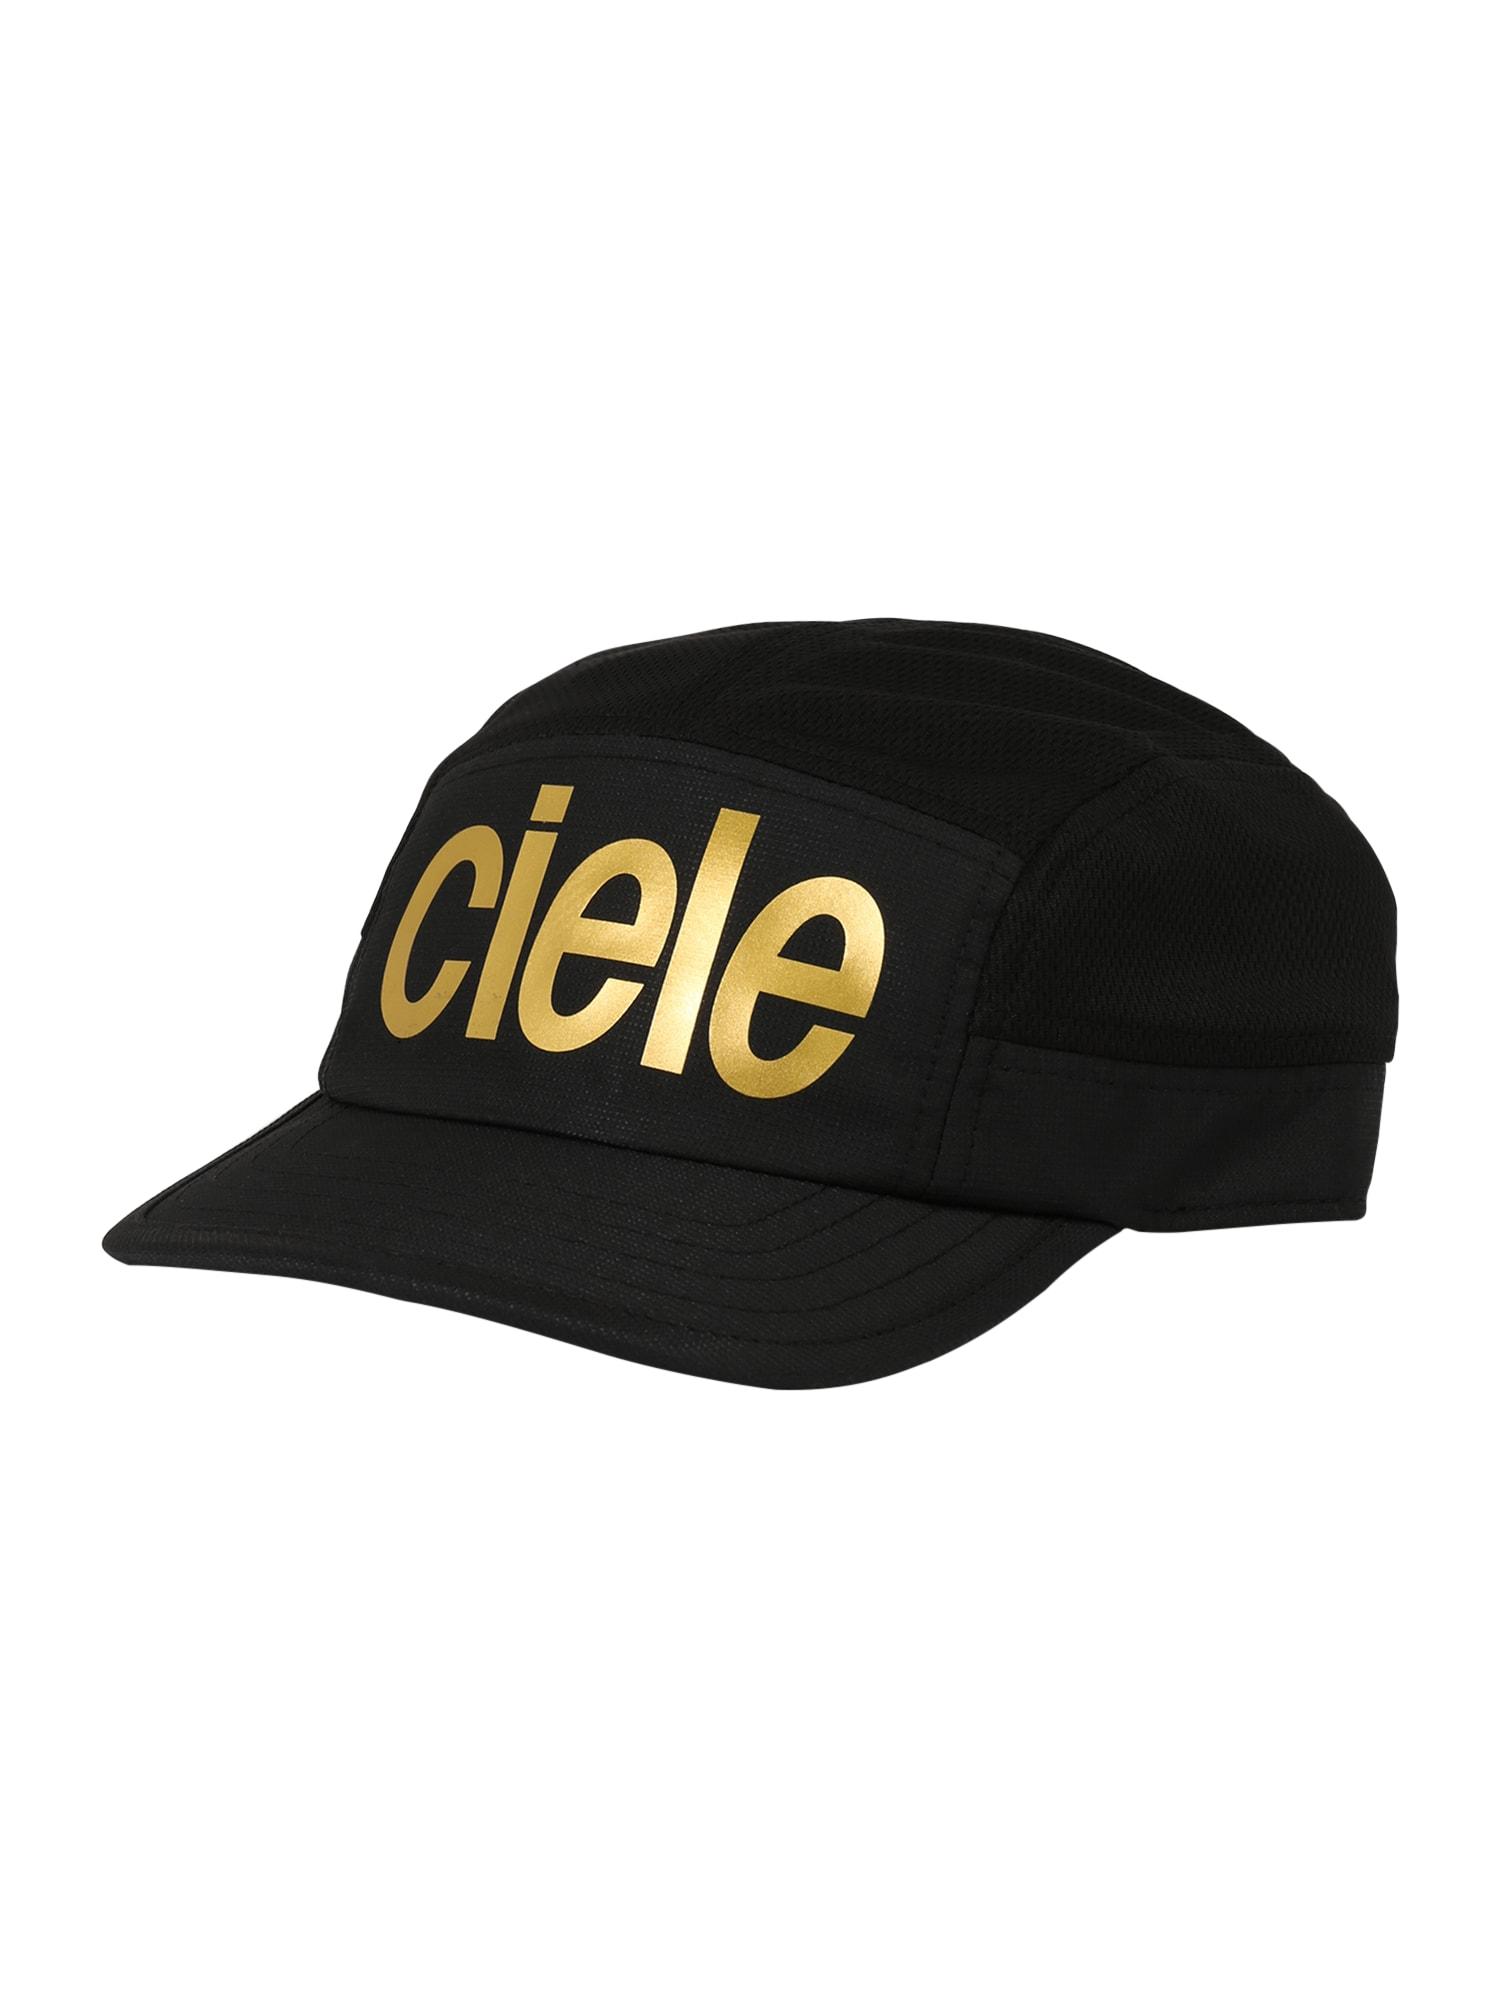 CIELE ATHLETICS Kepurė juoda / auksas